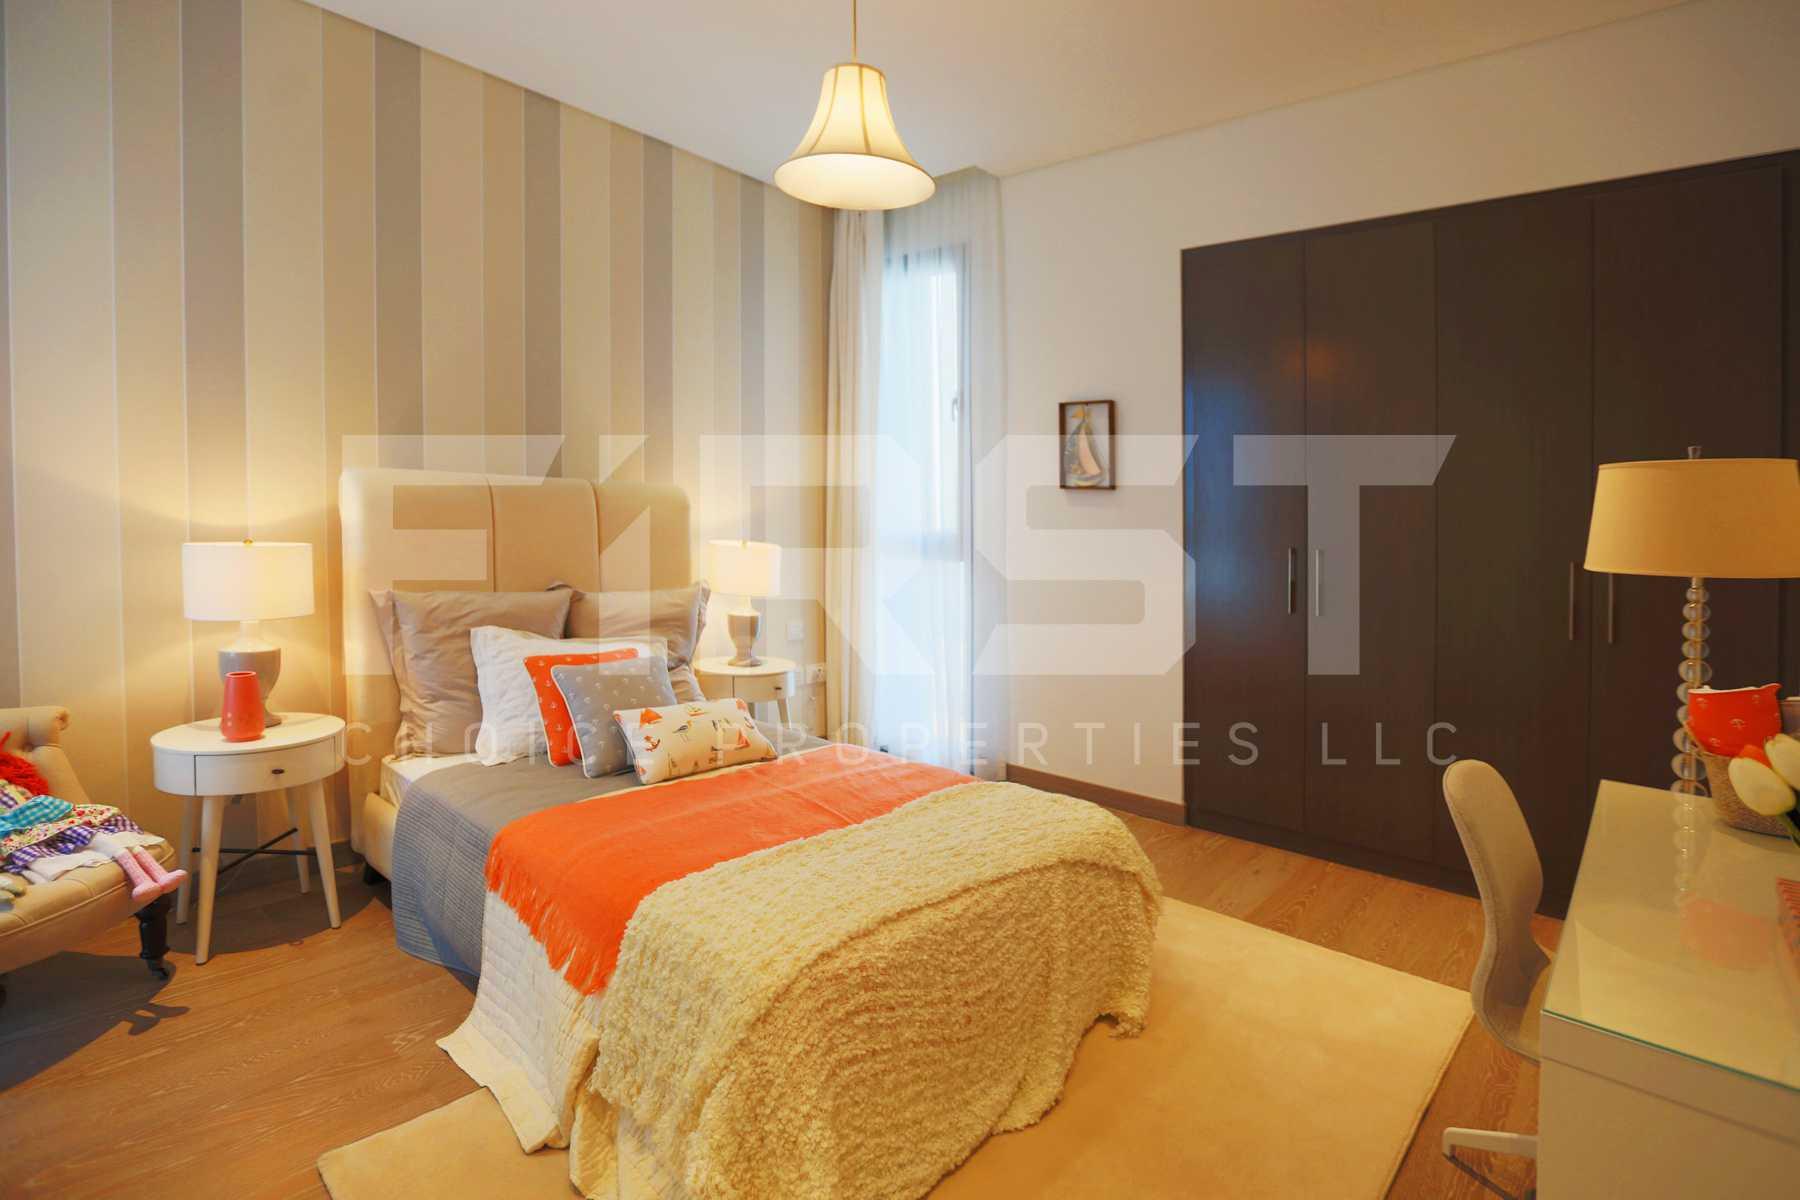 Internal Photo of 4 Bedroom Villa Type 4F in Yas Acres Yas Island Abu Dhabi UAE (10).jpg